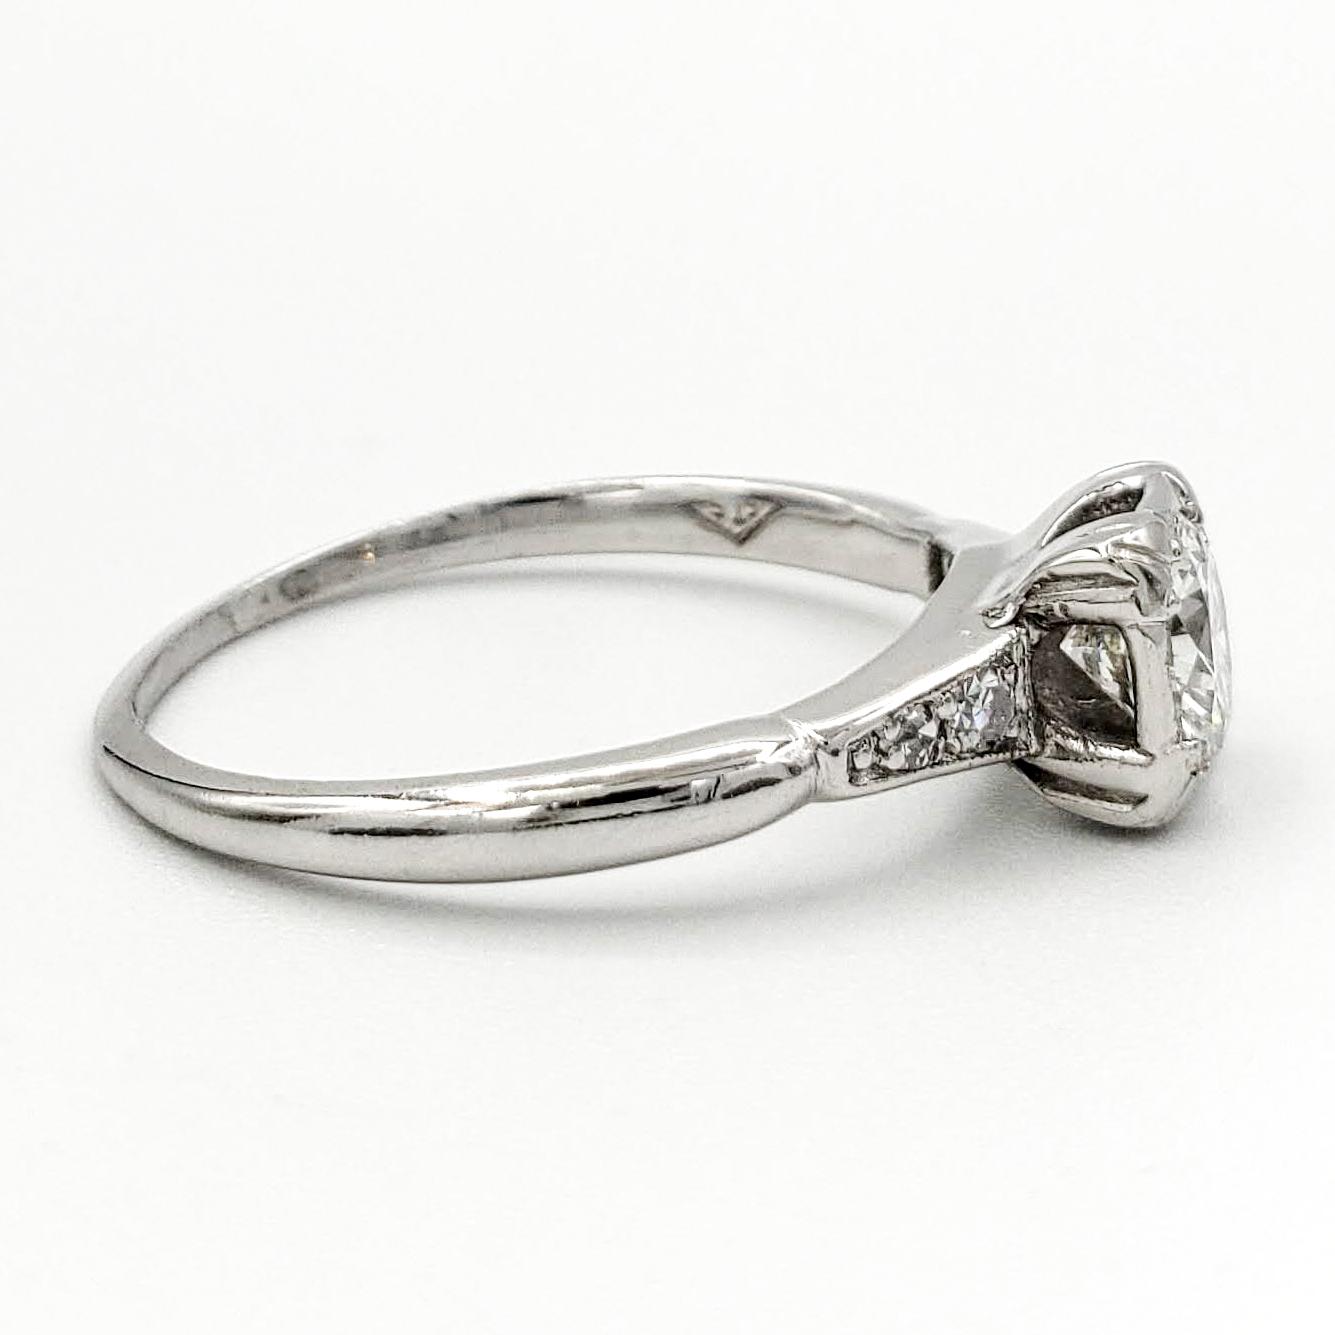 vintage-platinum-engagement-ring-with-0-44-carat-round-brilliant-cut-diamond-egl-g-vs1